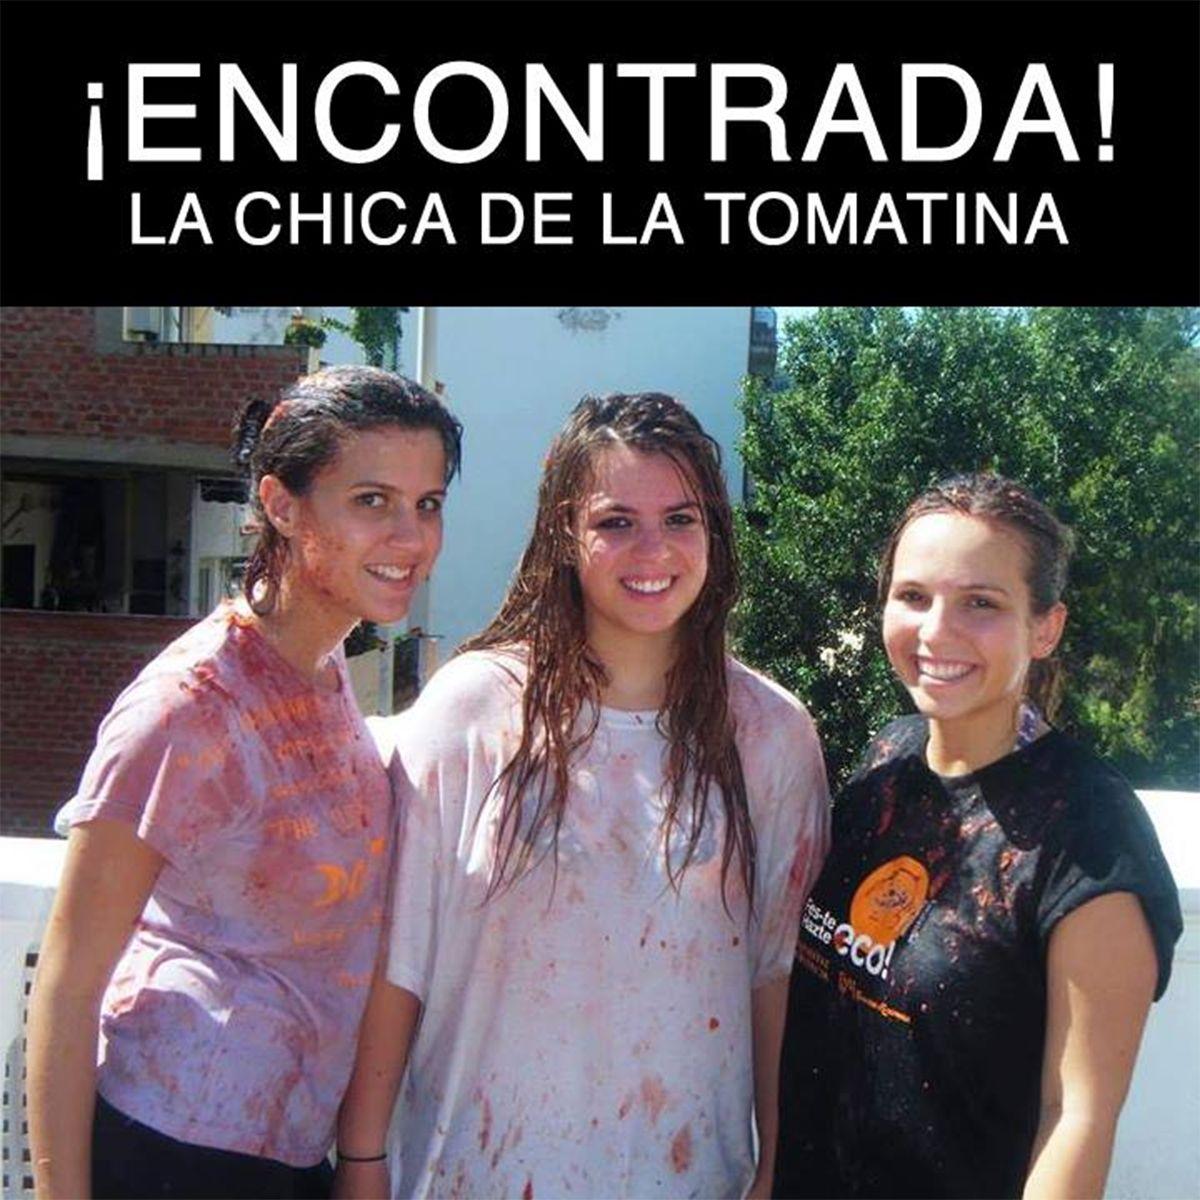 La chica de la Tomatina